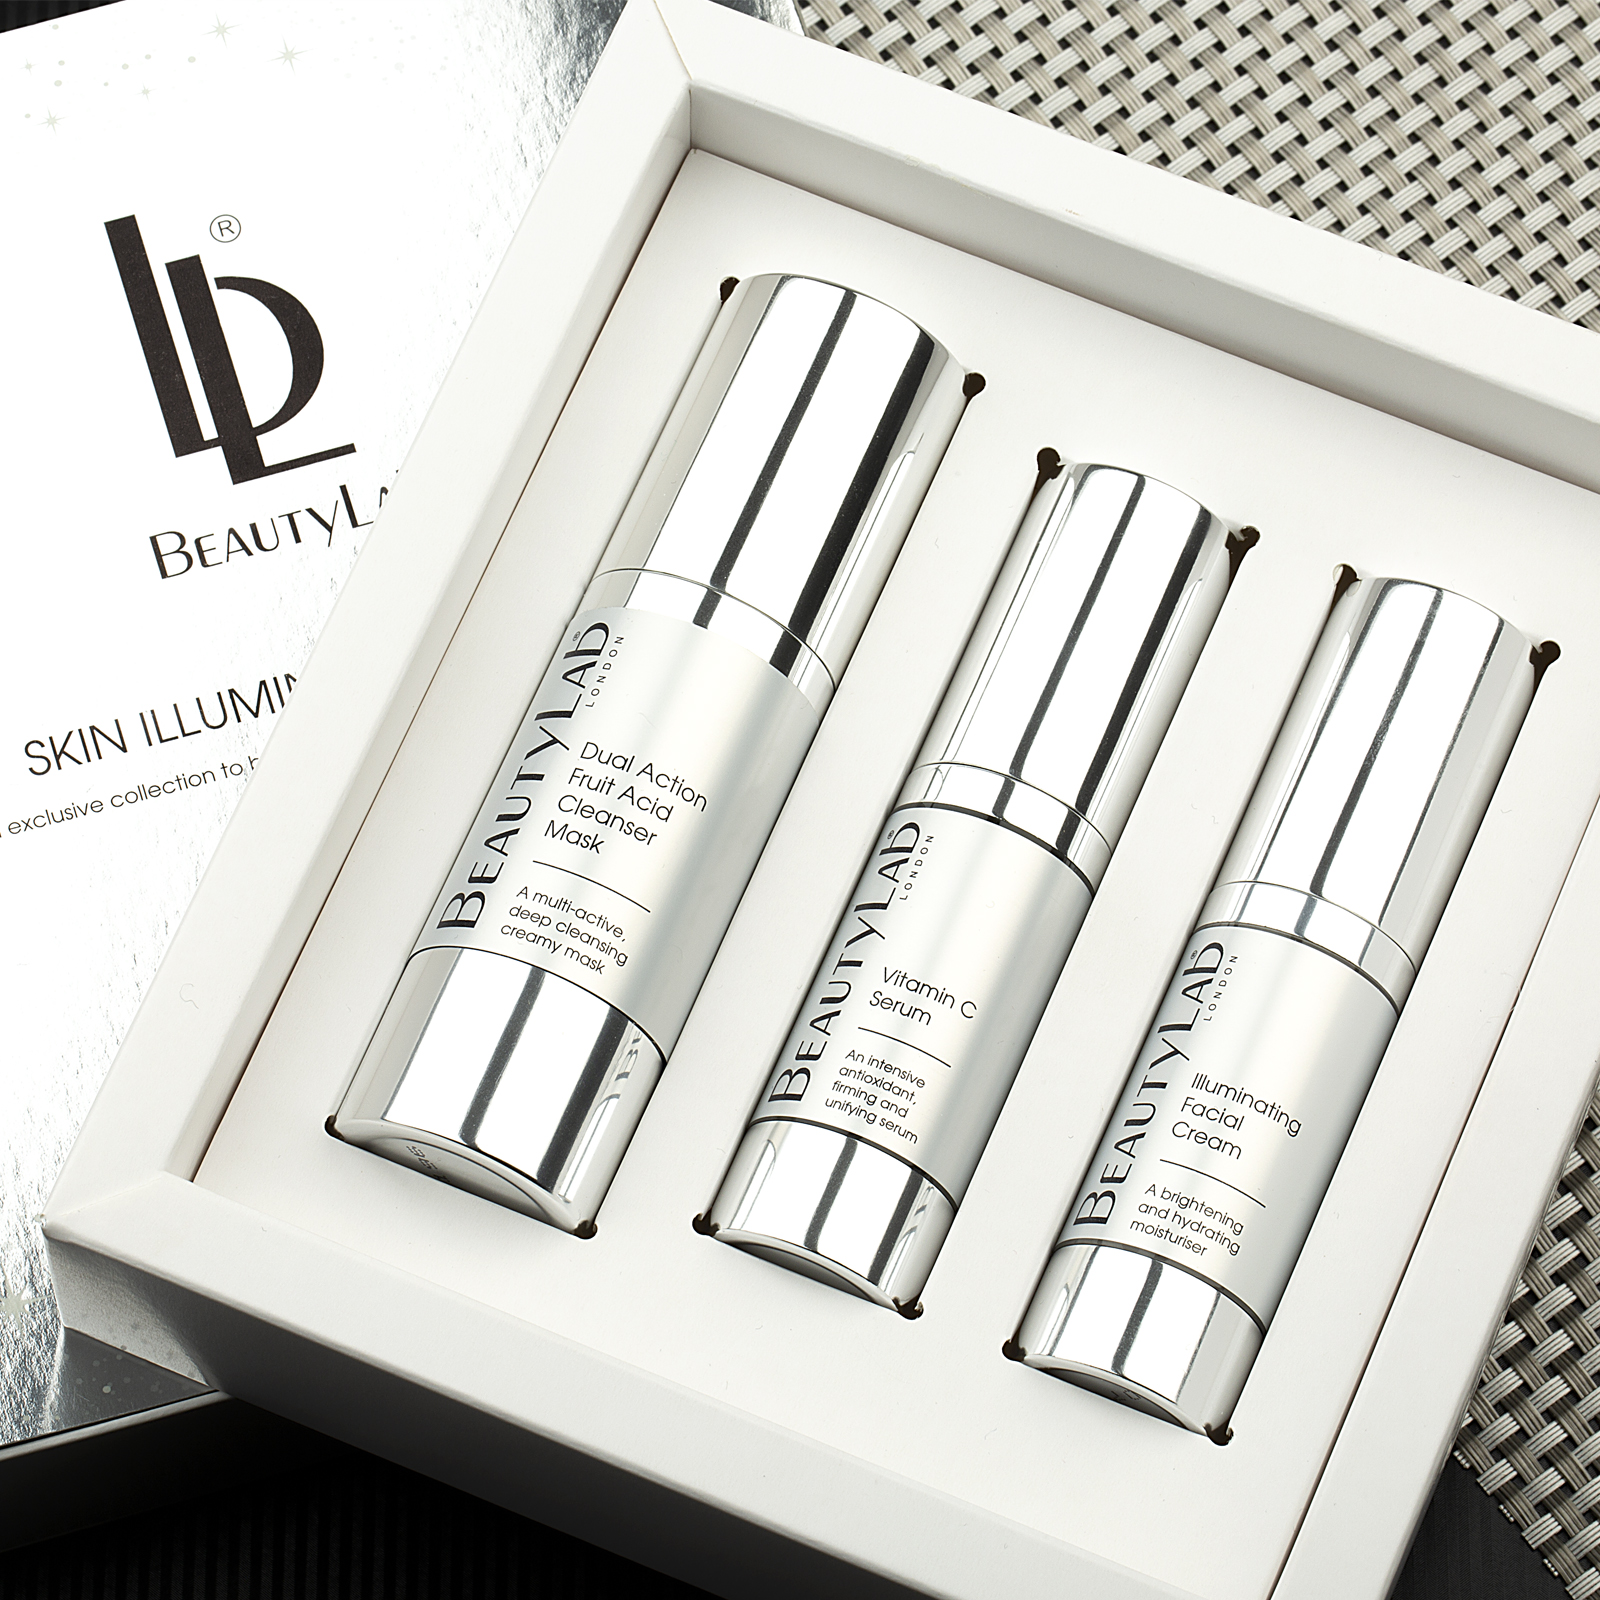 Skin Illuminating Beauty Gift Set products